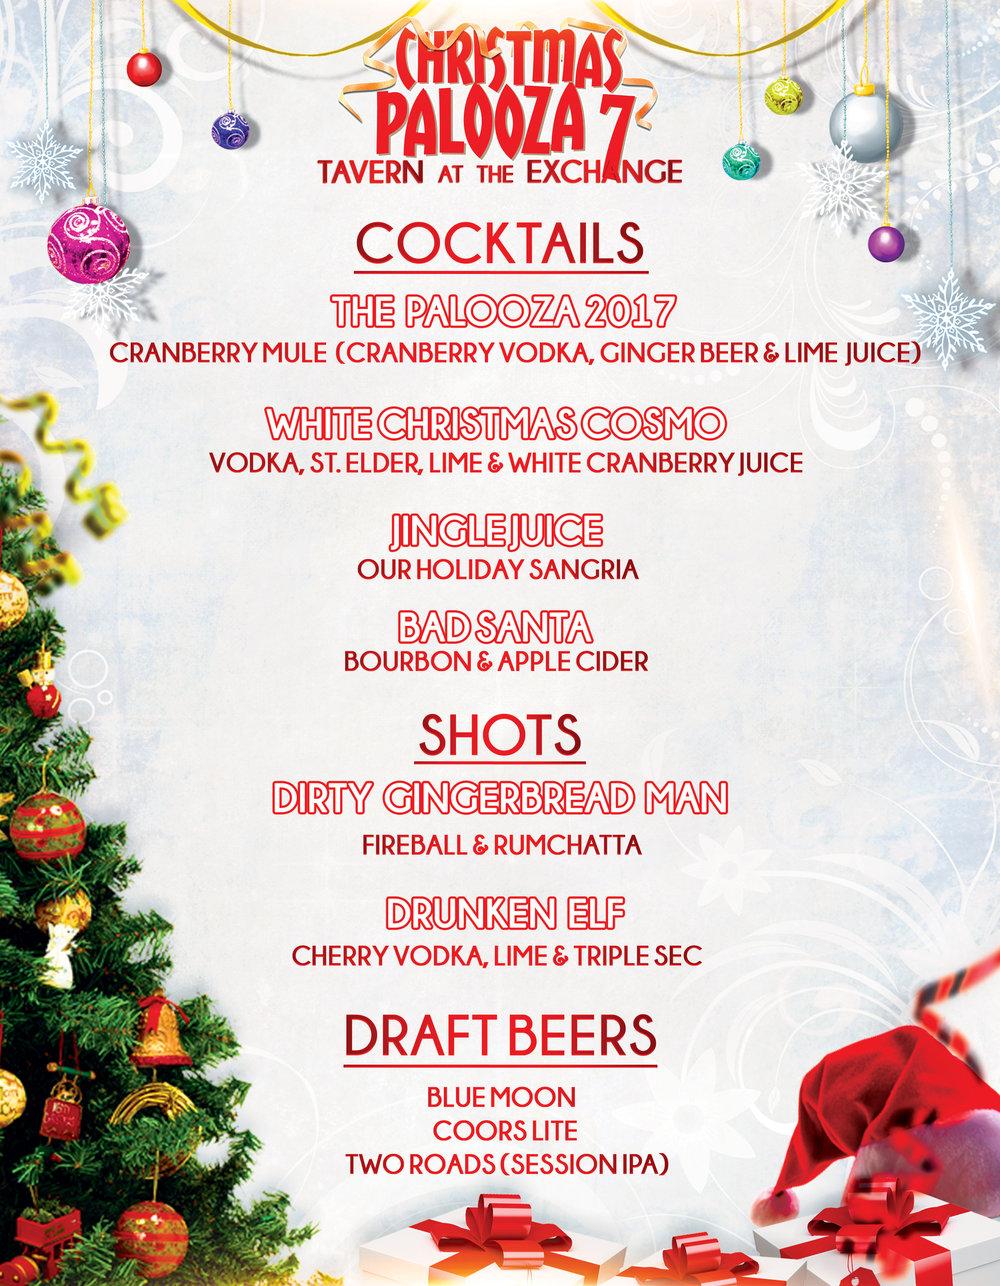 ChristmasPalooza7-TavernattheExchange-DRINK-MENU.jpg